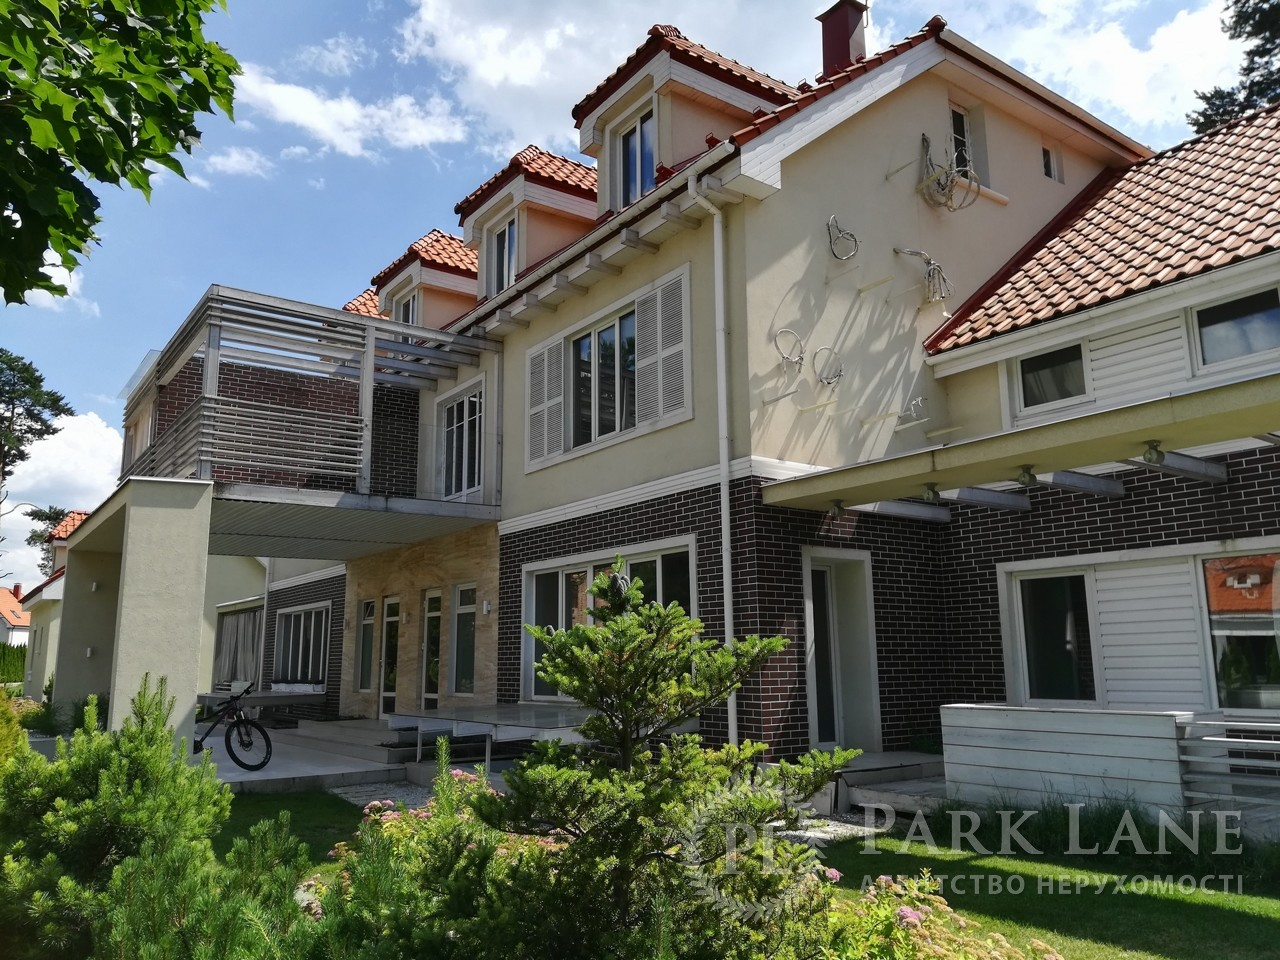 Квартира Столичное шоссе, 149, Киев, R-23590 - Фото 22